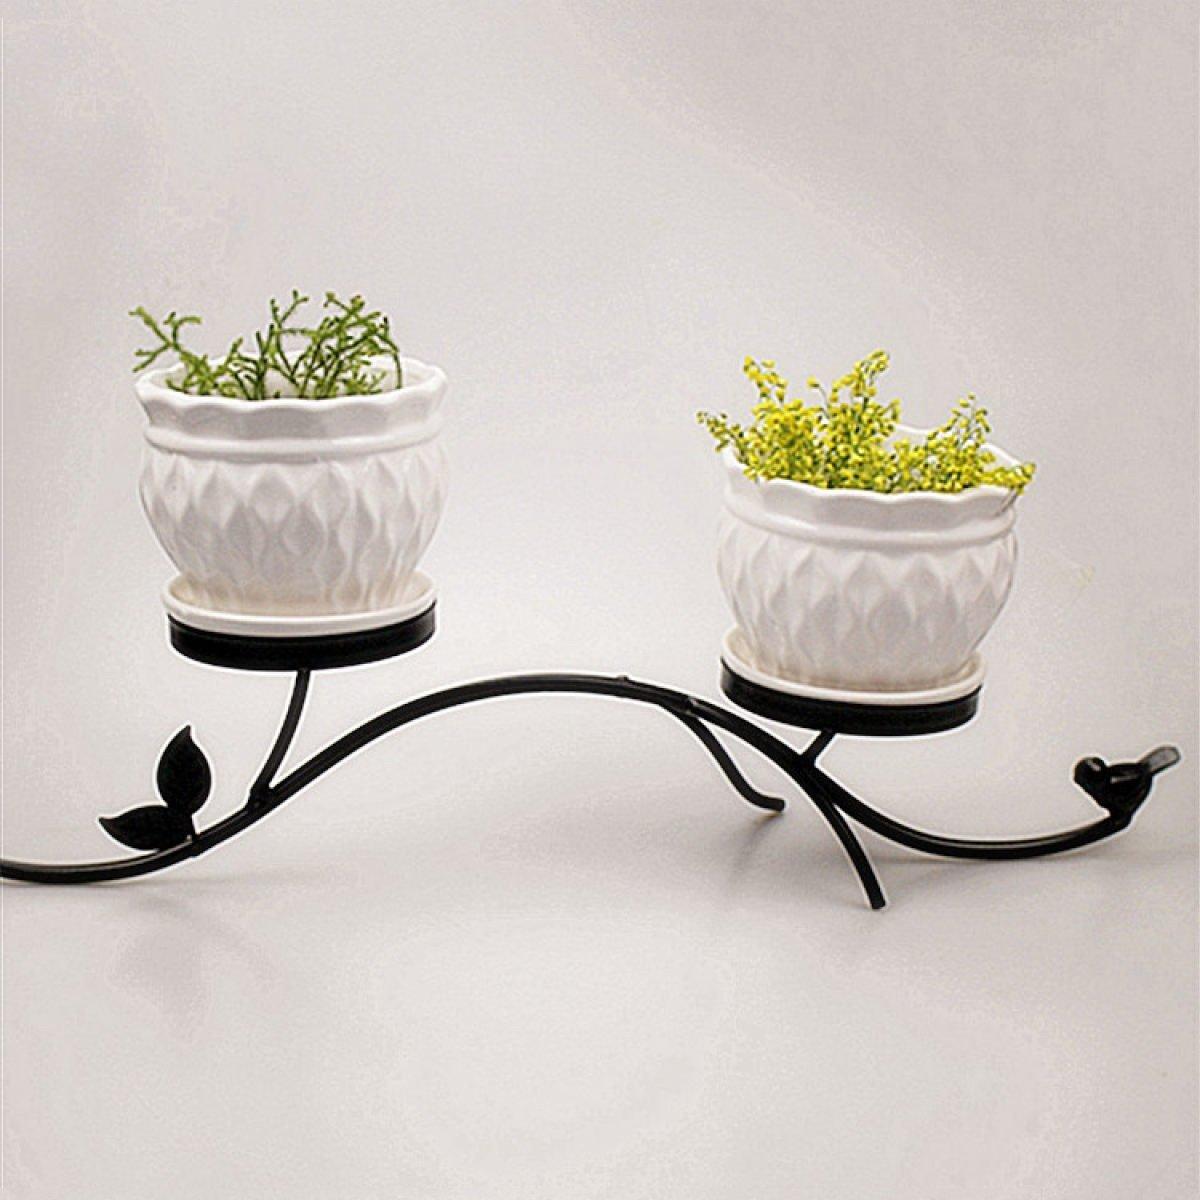 L;IAN Flower Pot Rack Iron Art Indoor Living Room Balcony Floor-Standing Multi-Functional Plant Flower Stand